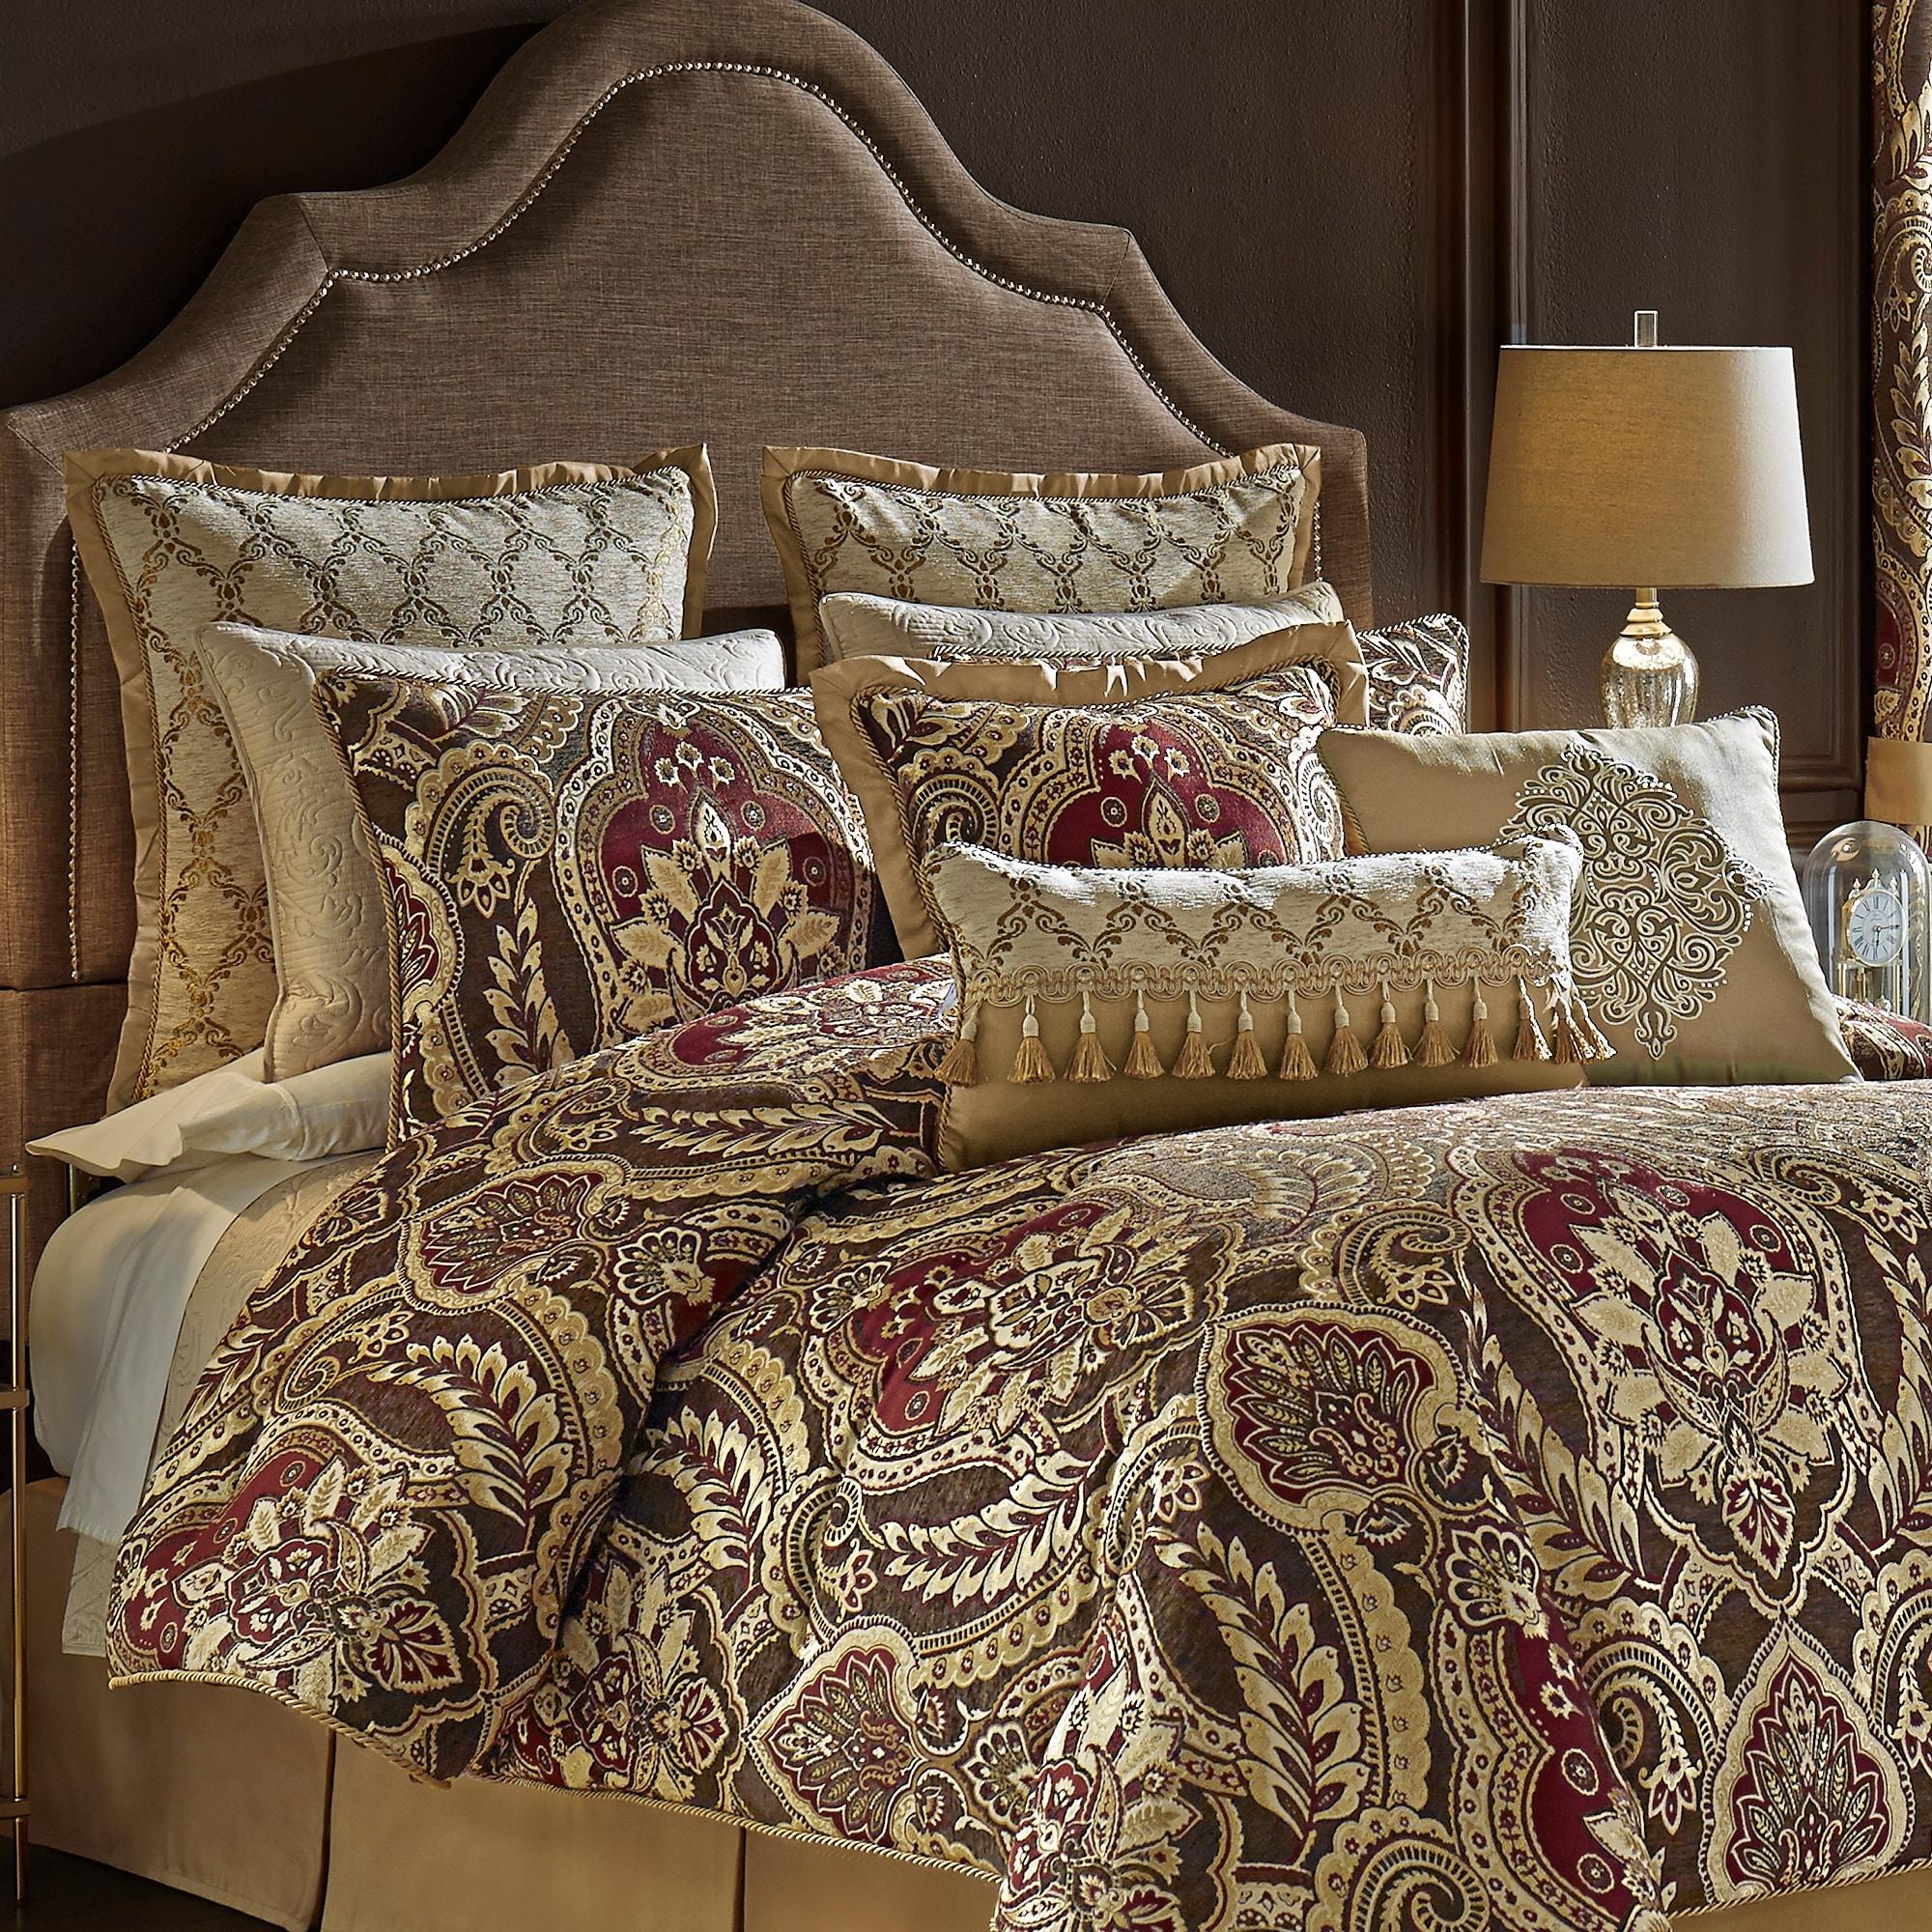 Shop Black Friday Deals On Croscill Julius 4 Pc Red Brown Gold Damask Bedding Set Overstock 29901662